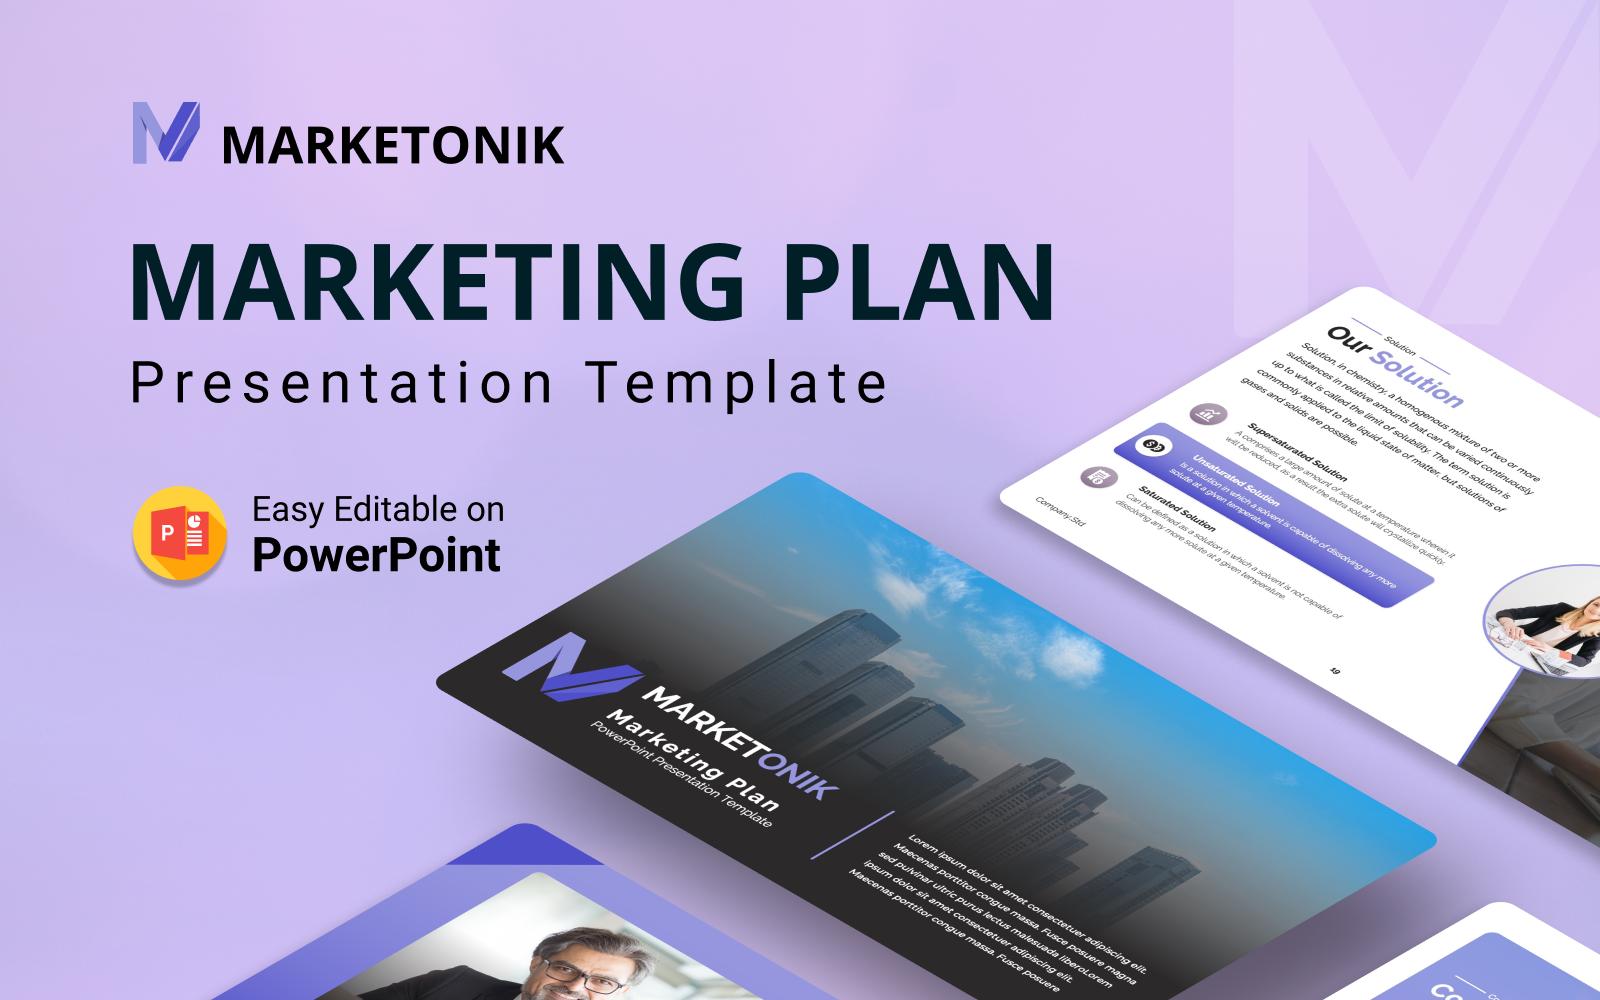 Marketonik – Marketing Plan PowerPoint Presentation Template